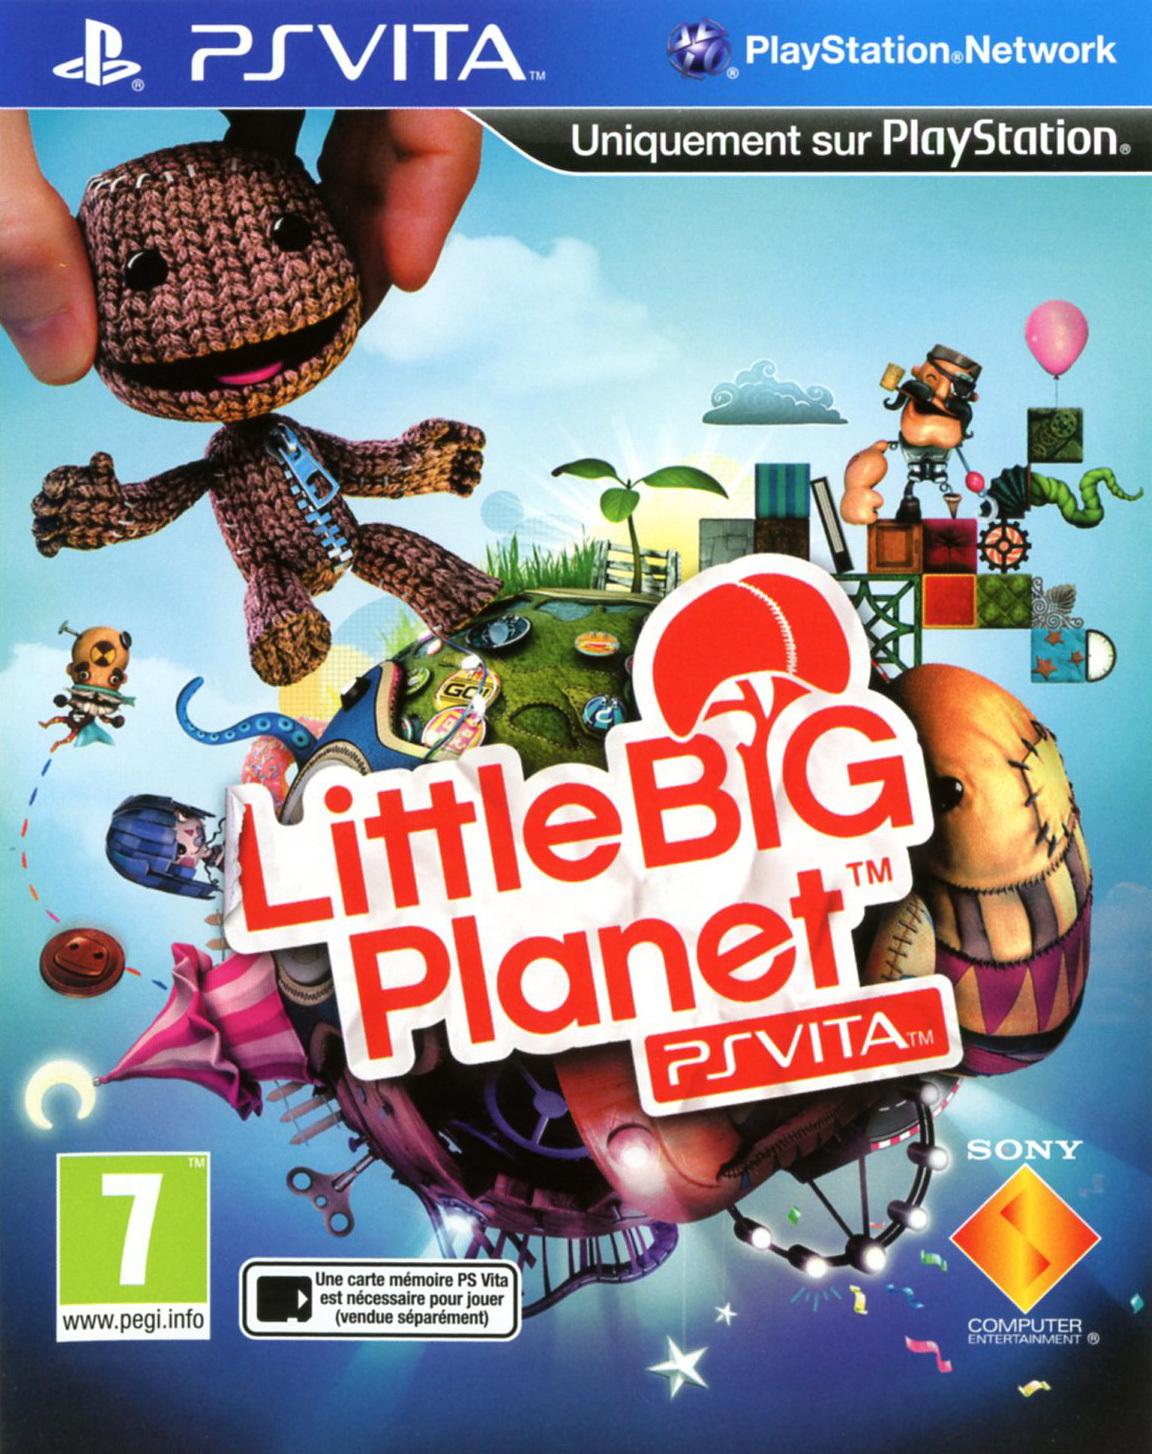 jaquette-littlebigplanet-playstation-vita-cover-avant-g-1348066715.jpg